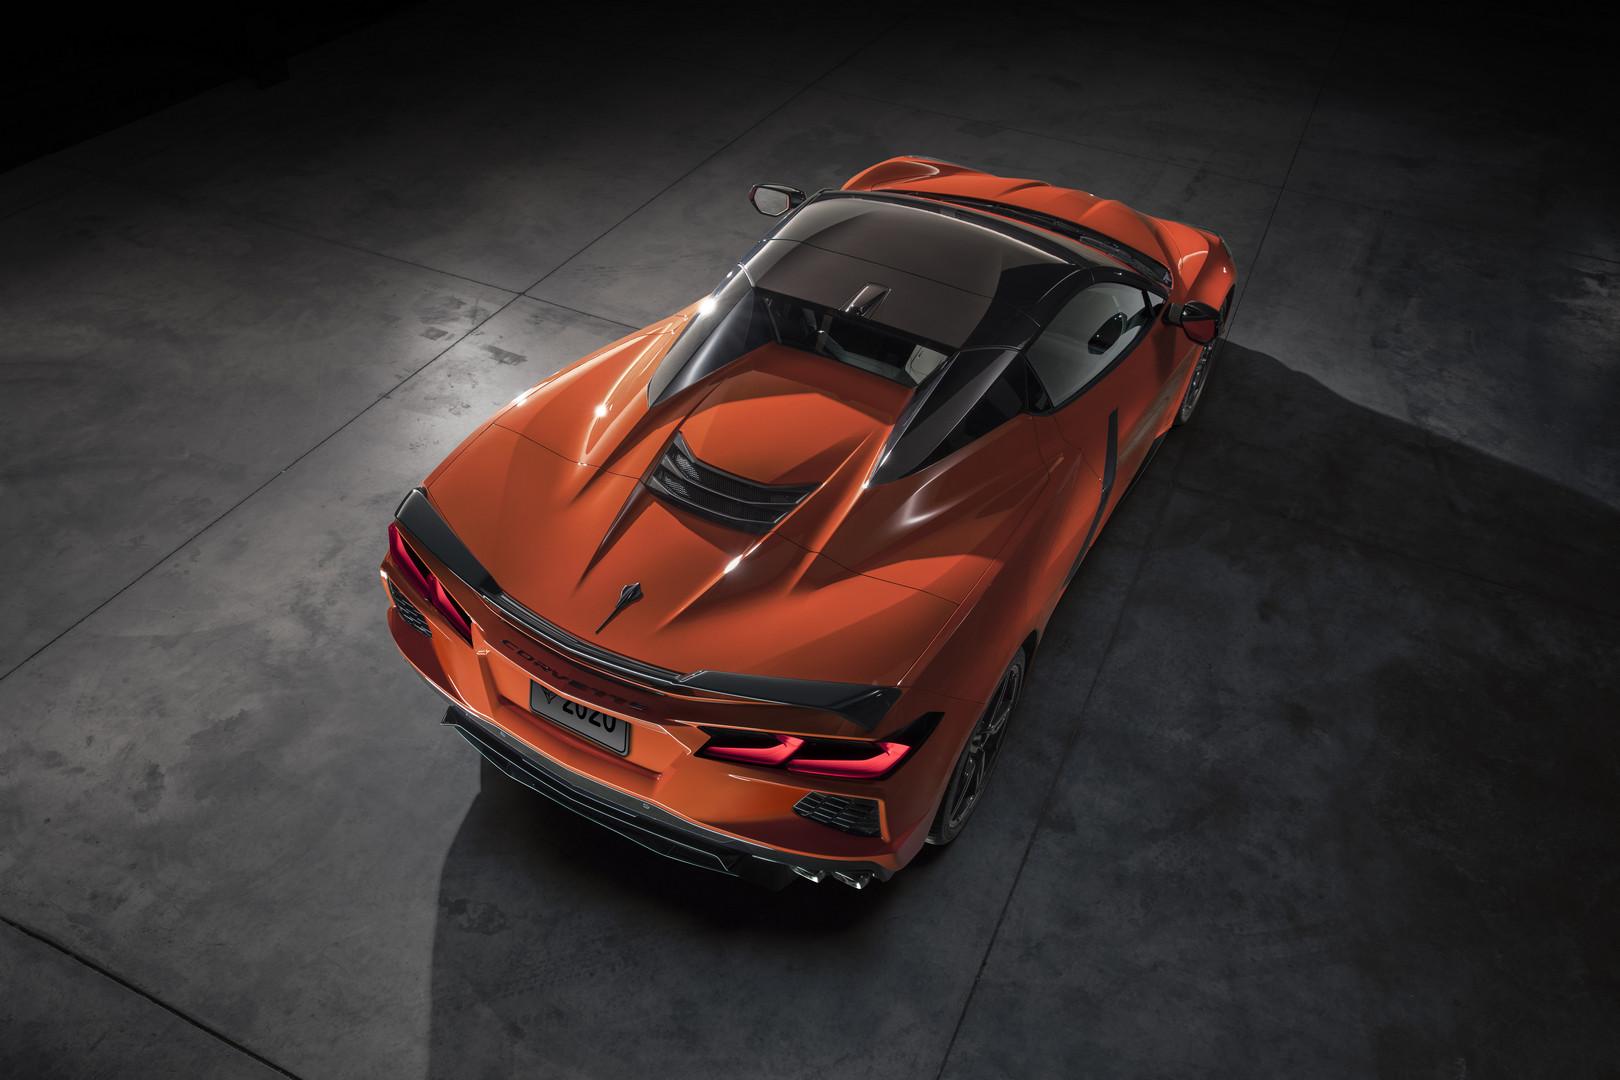 2020 Corvette Convertible Specs